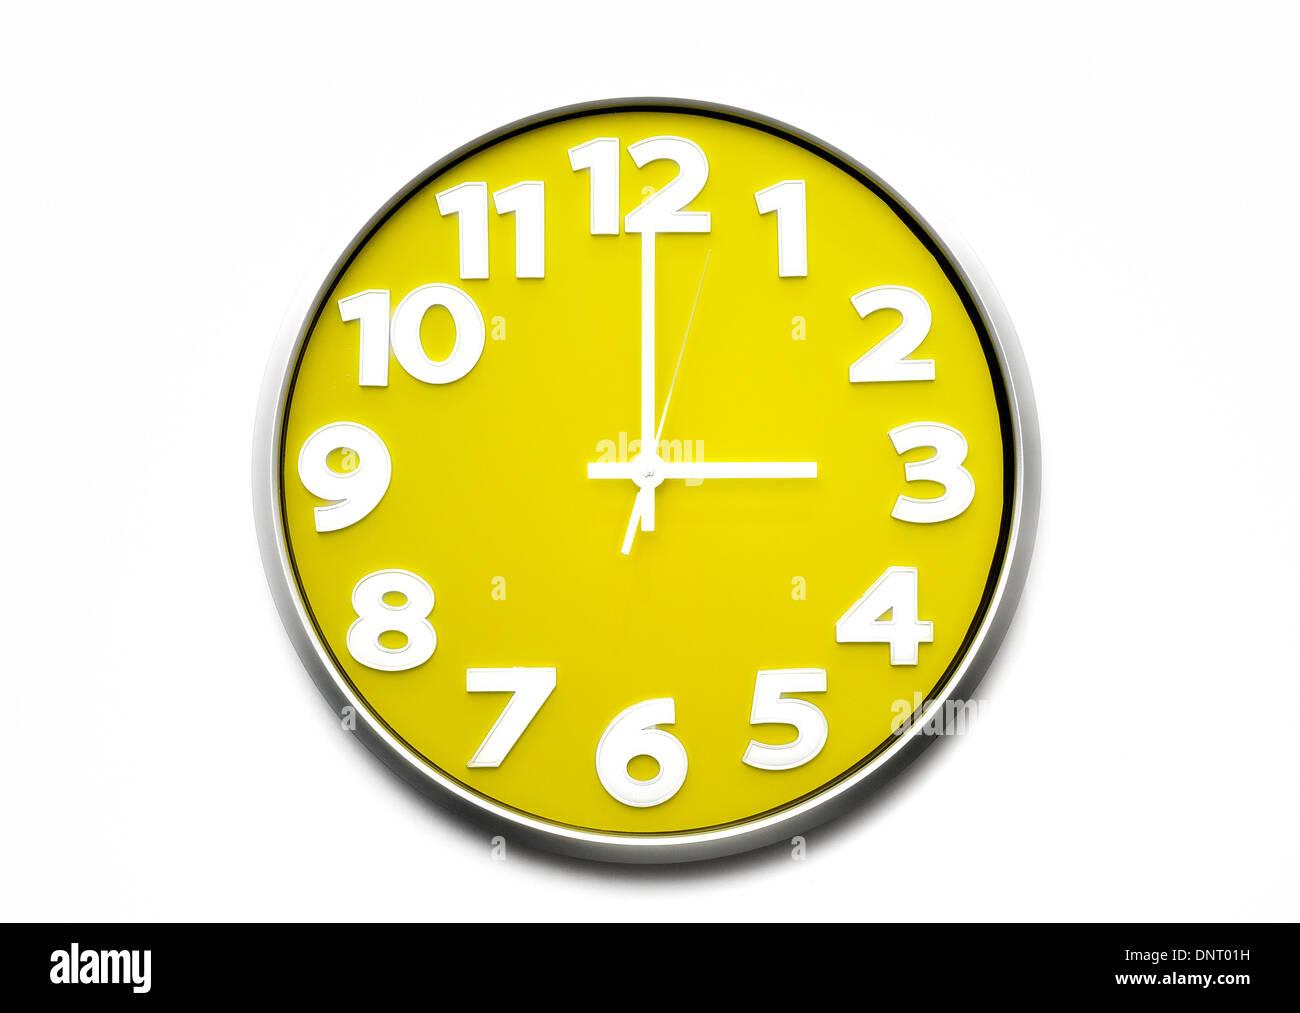 Yellow Clock Face 3 O Clock The Clock Strikes Three 1500